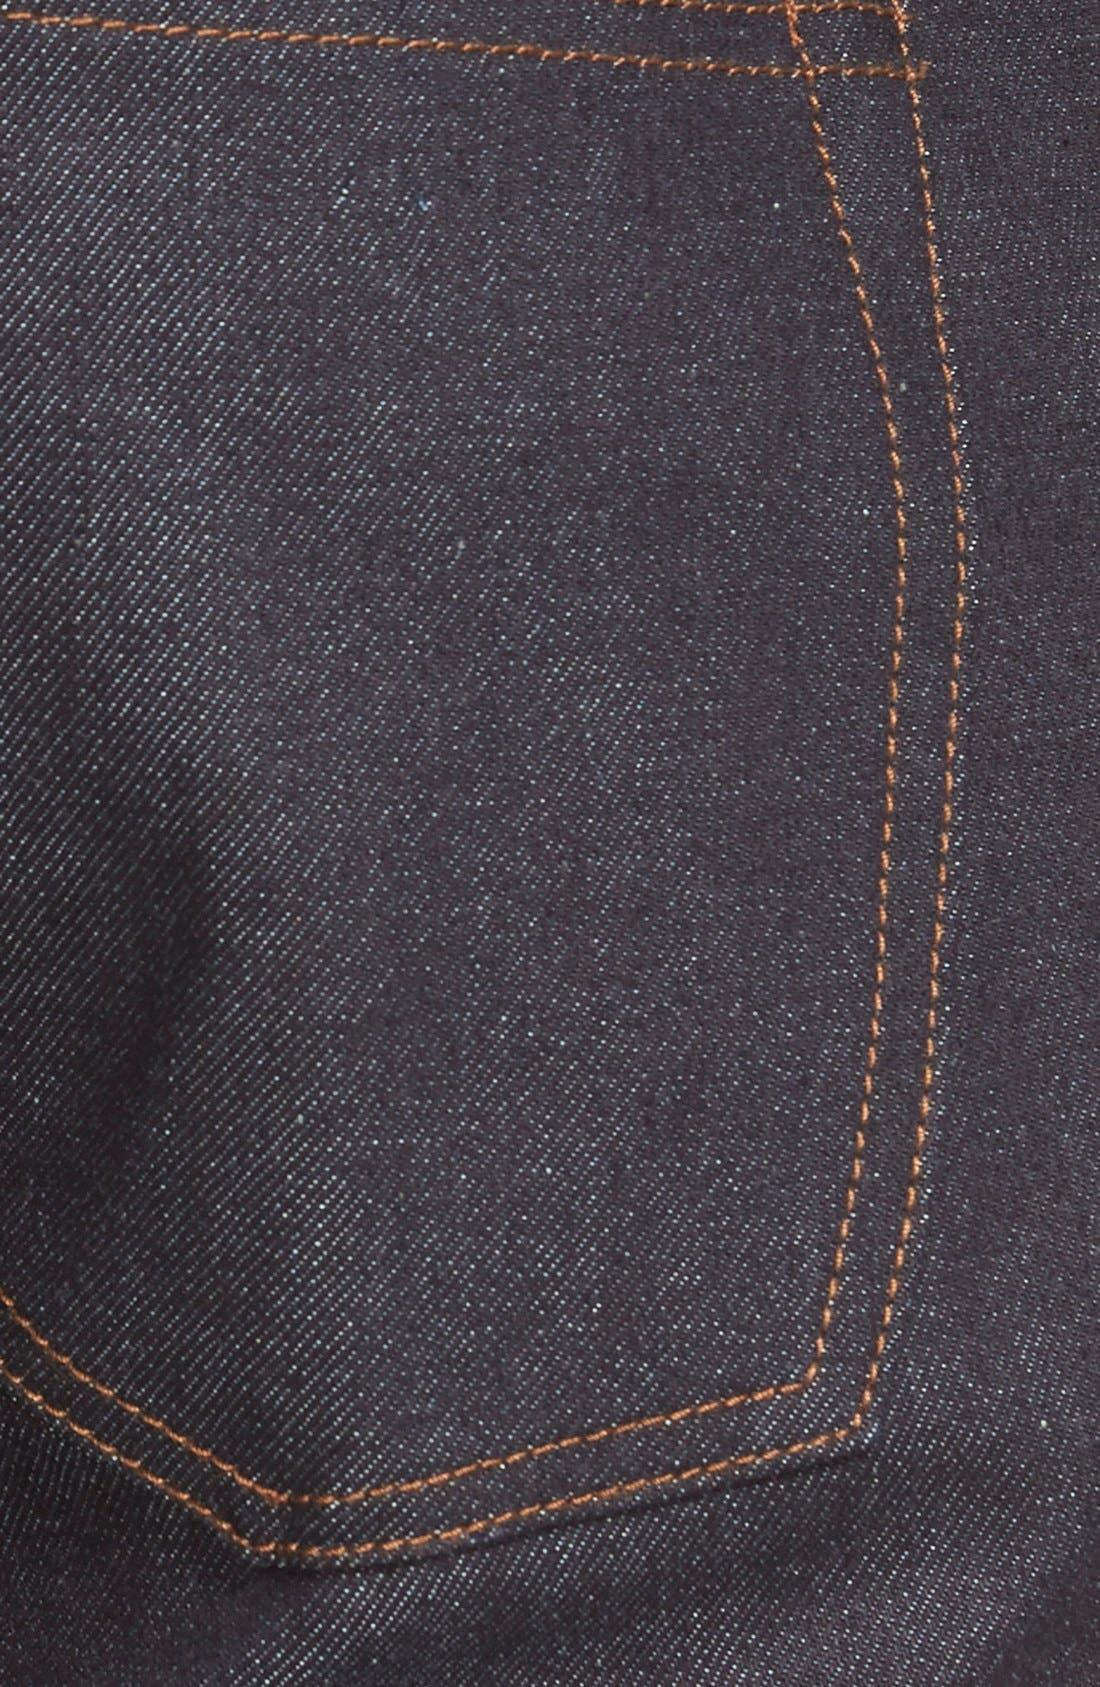 'UB122' Skinny Fit Raw Selvedge Jeans,                             Alternate thumbnail 4, color,                             401